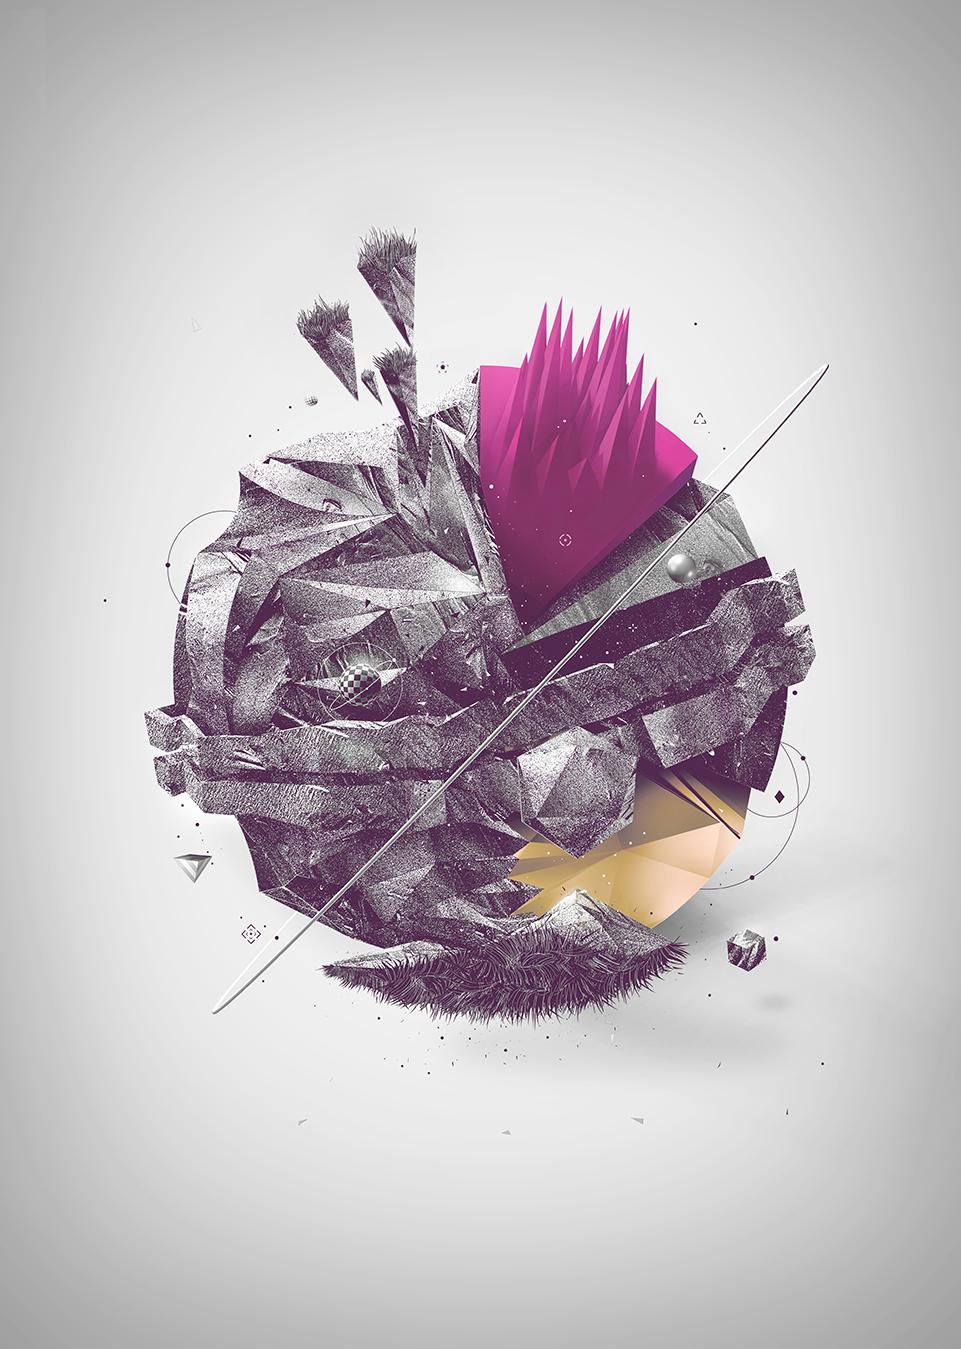 amazing-graphic-design-works-by-rogier-de-boeve-1